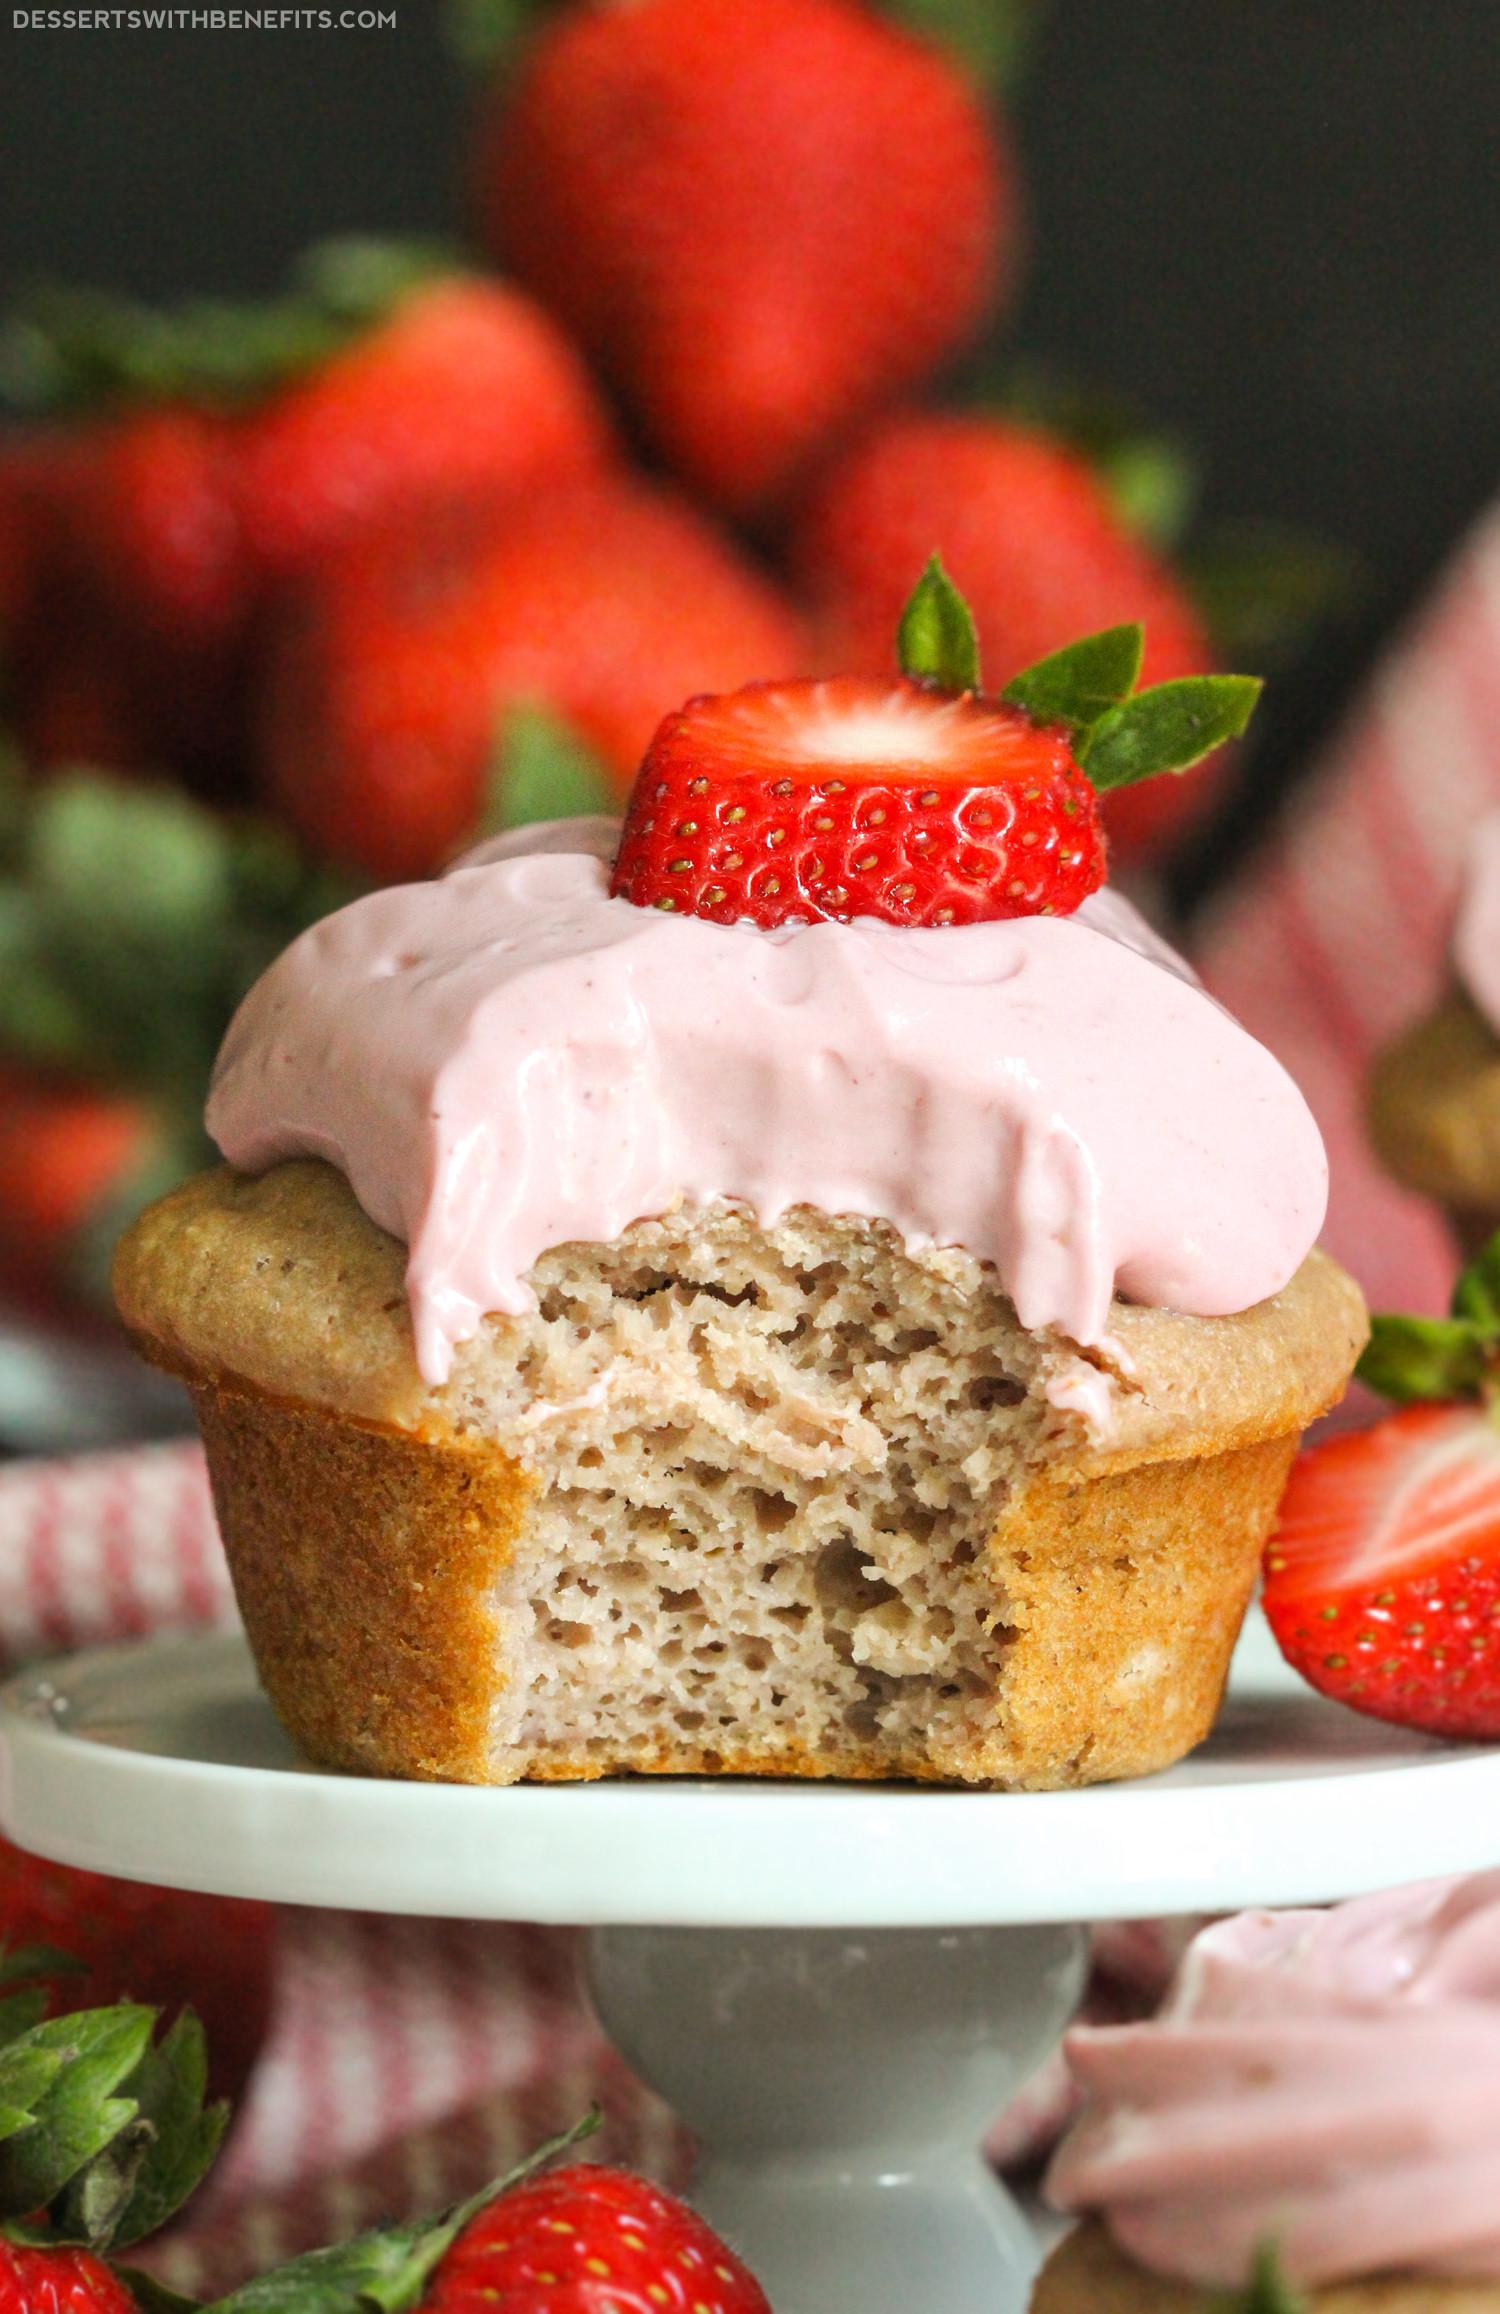 Healthy Strawberry Dessert Recipes  Healthy Strawberry Cupcakes Recipe